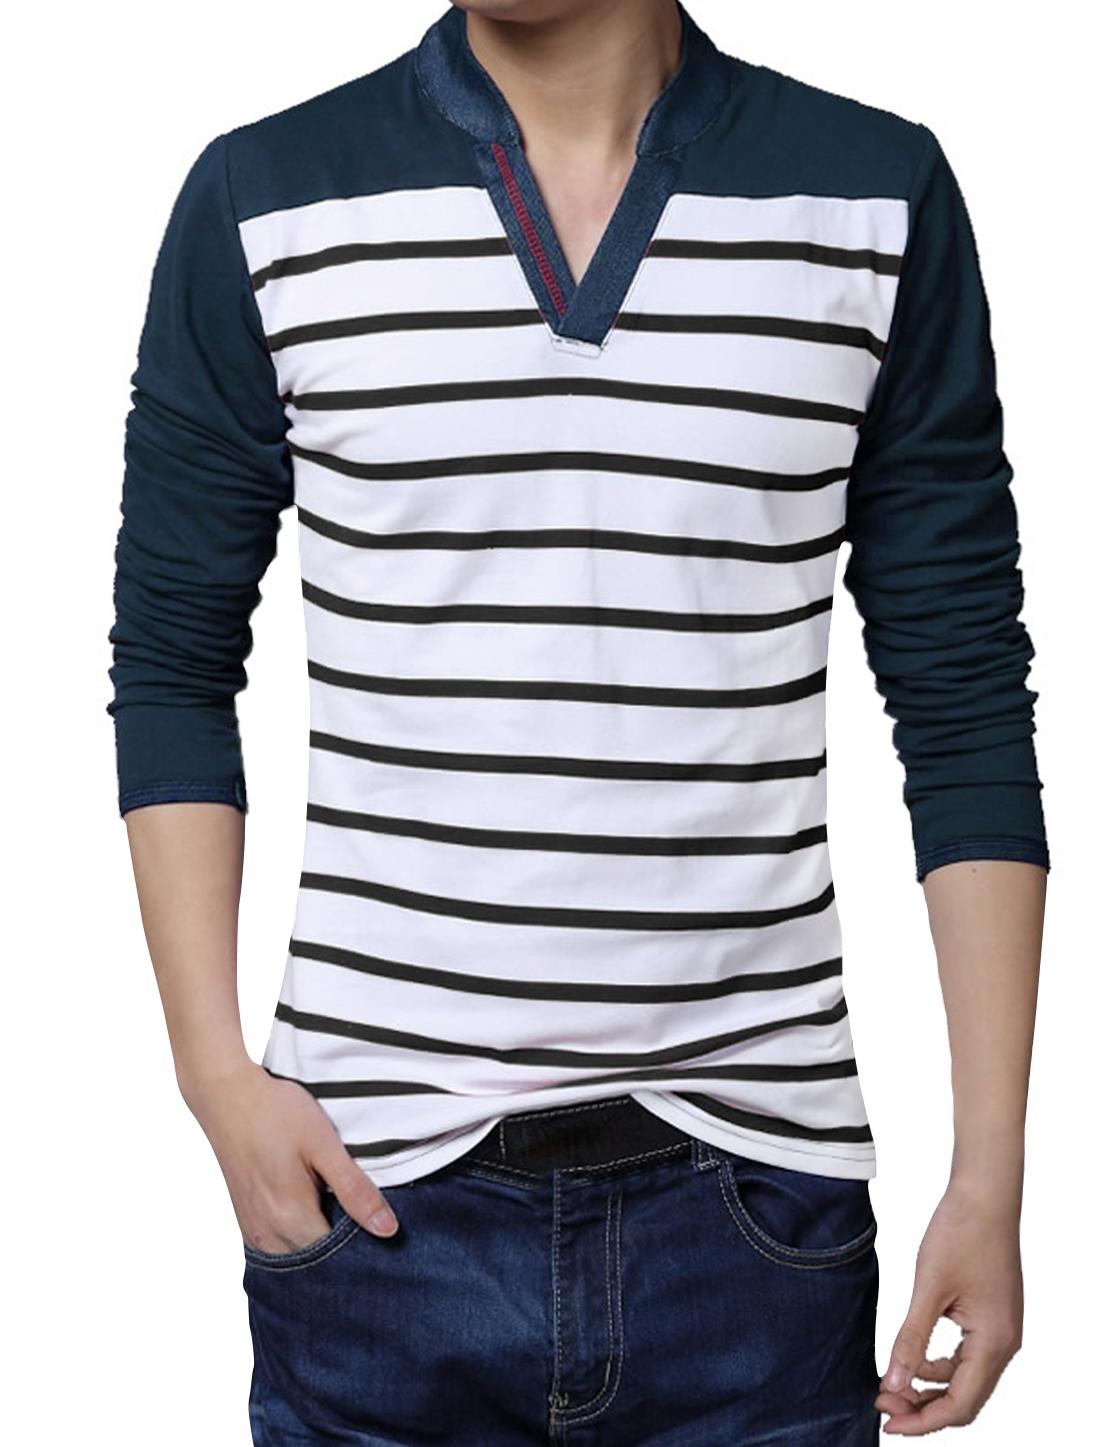 Men Long Sleeve Panel Design Stripes Shirt Navy Blue Black M